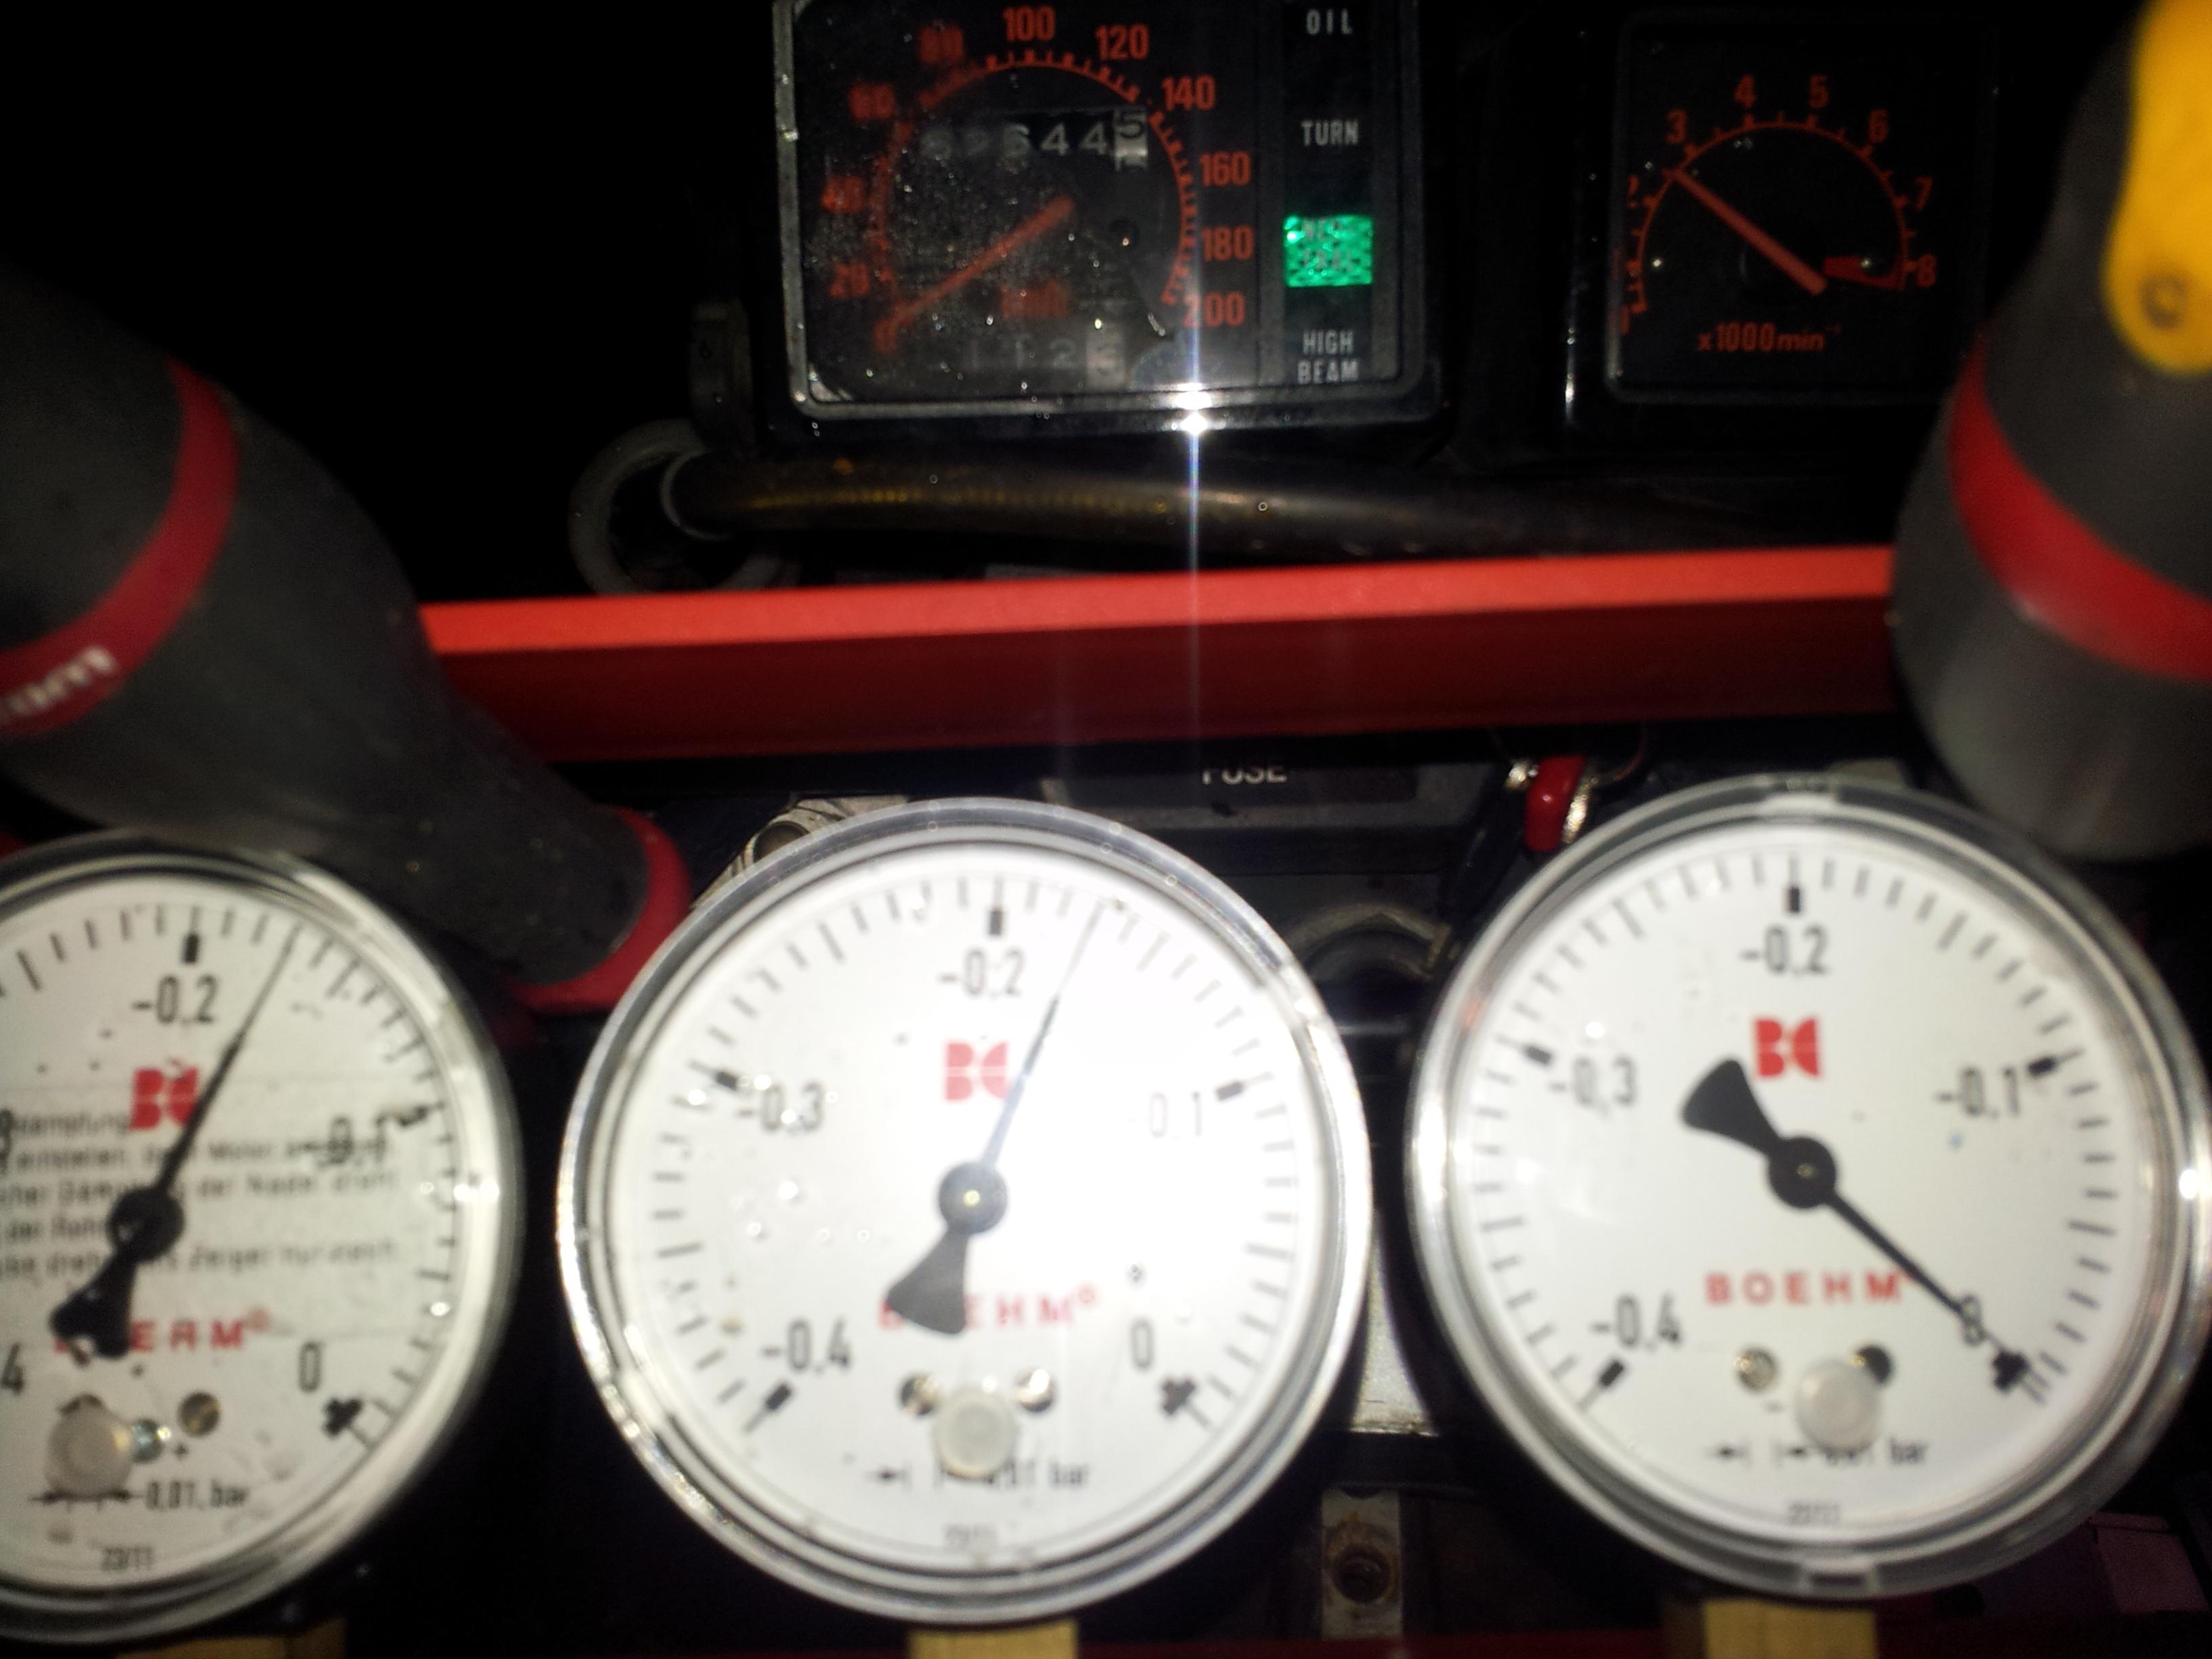 XLV 750 : Ralenti accéléré (2000/2500 tours/m)  [RESOLU] - Page 3 XLV%20750%20syncro%202500